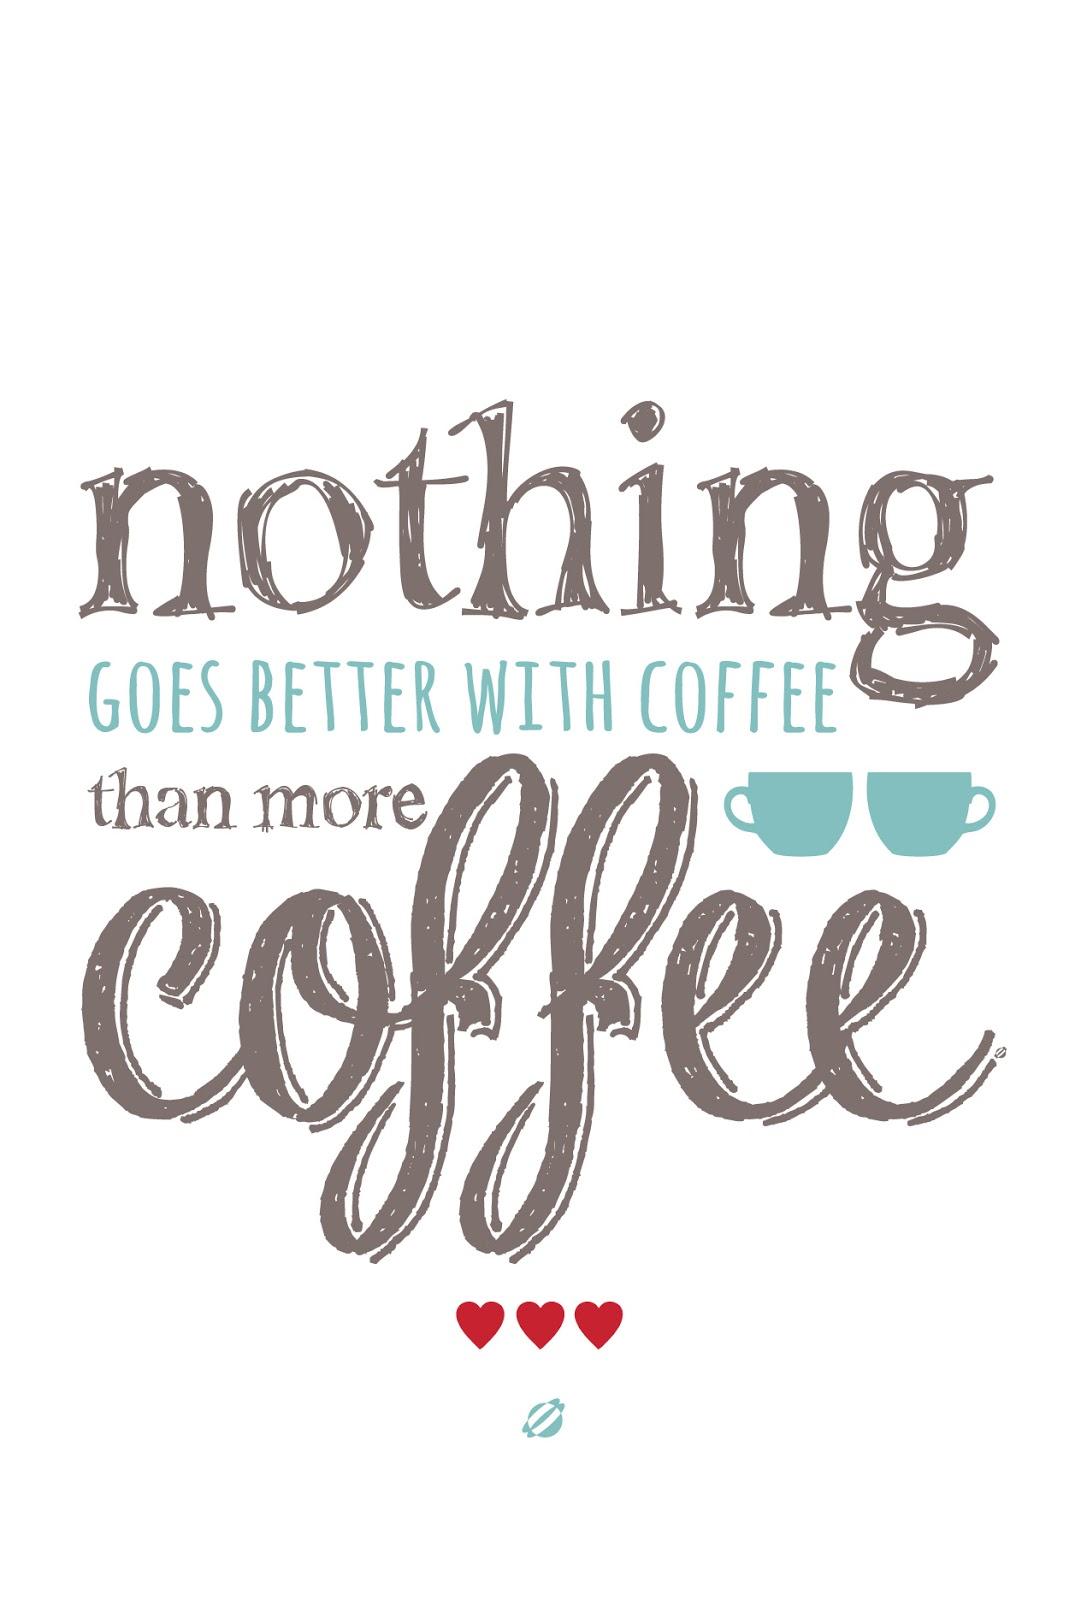 CoffeeMORECoffeeLBG14-01.jpg